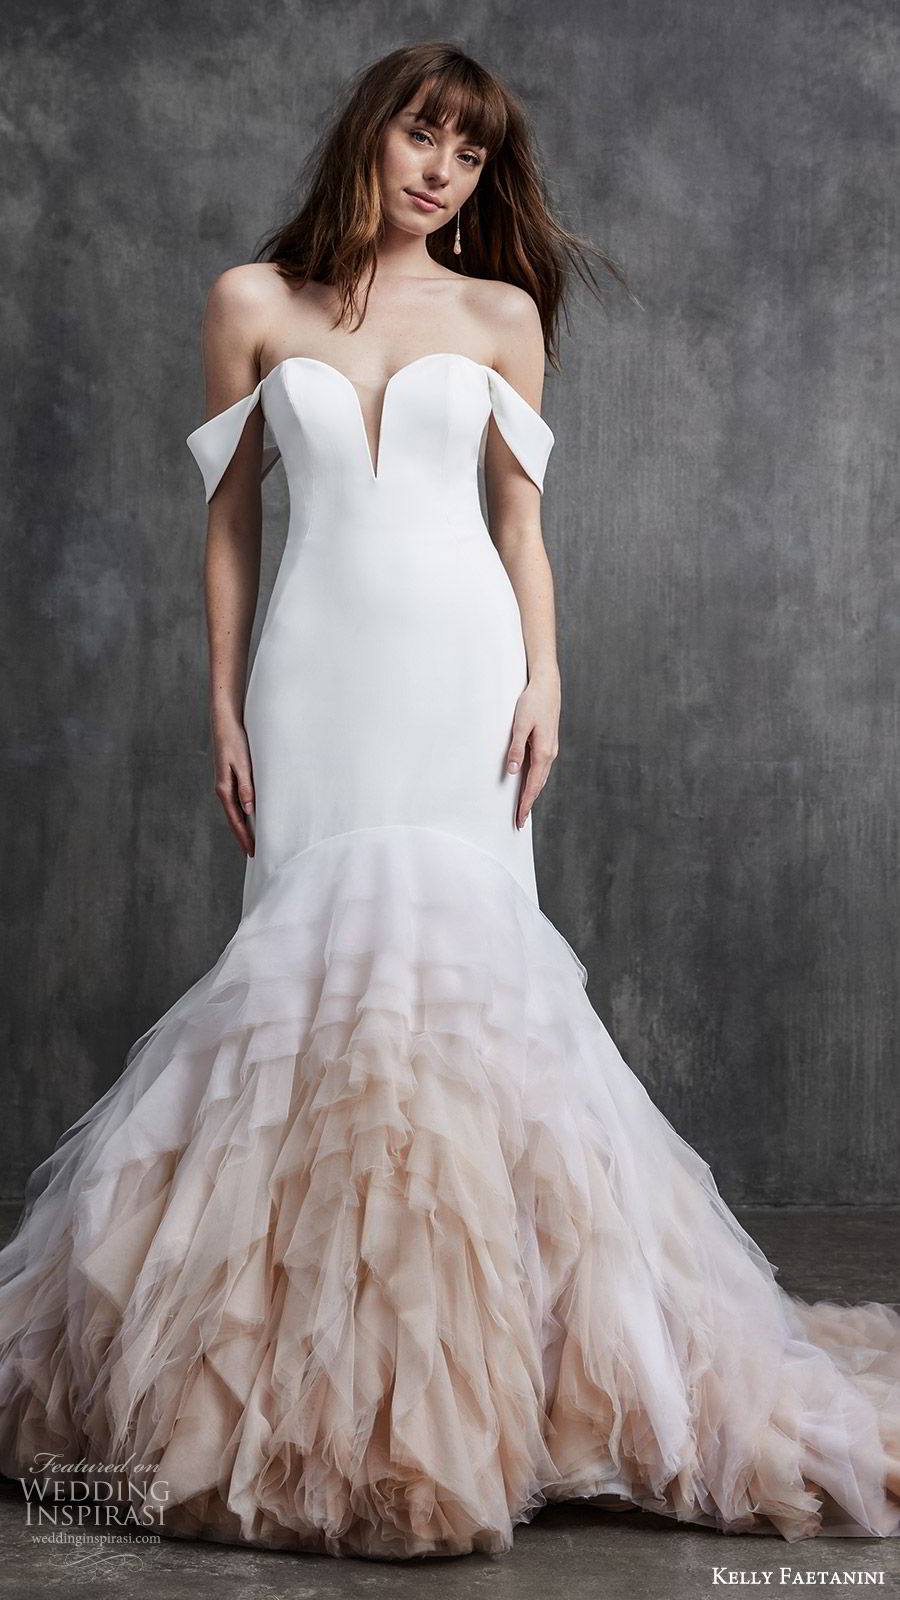 kelly faetanini spring 2020 bridal off shoulder split sweetheart neckline fit flare mermaid ruffle skirt wedding dress (5) clean chapel train ombre blush mv